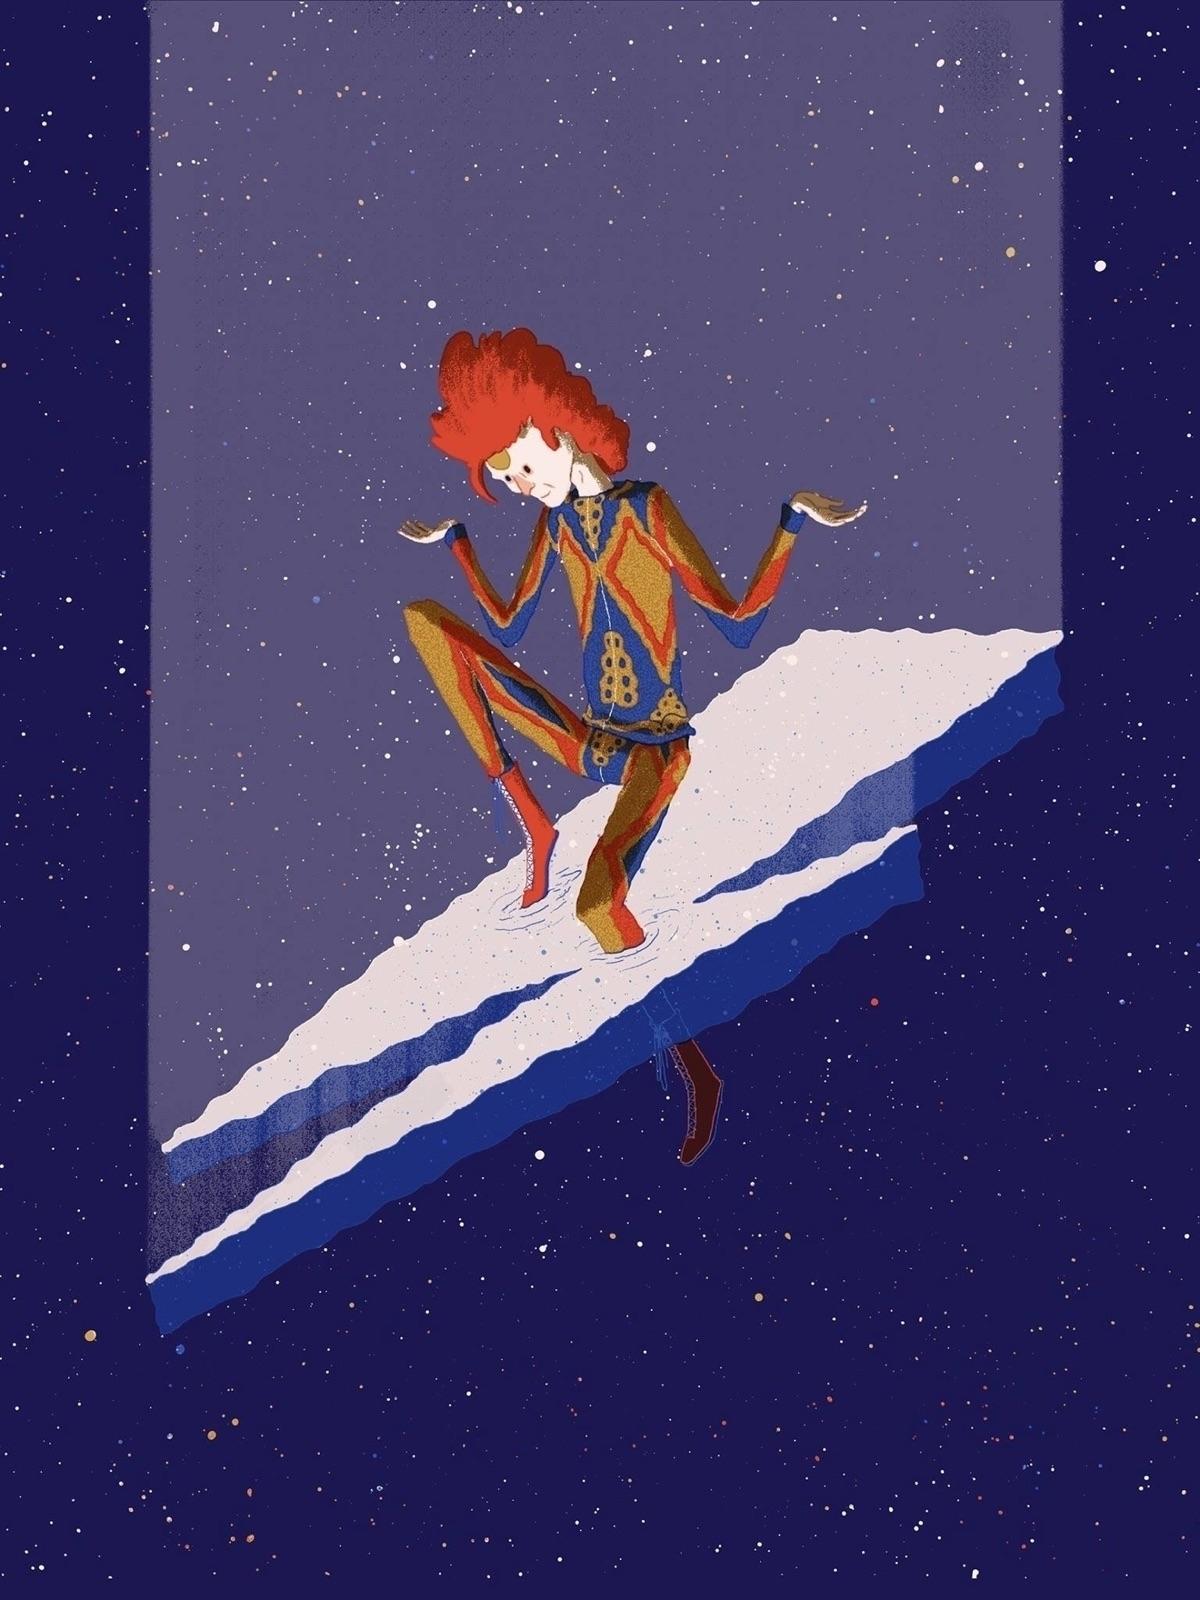 Starman Transcends - editorial, illustration - jefflowryillo | ello